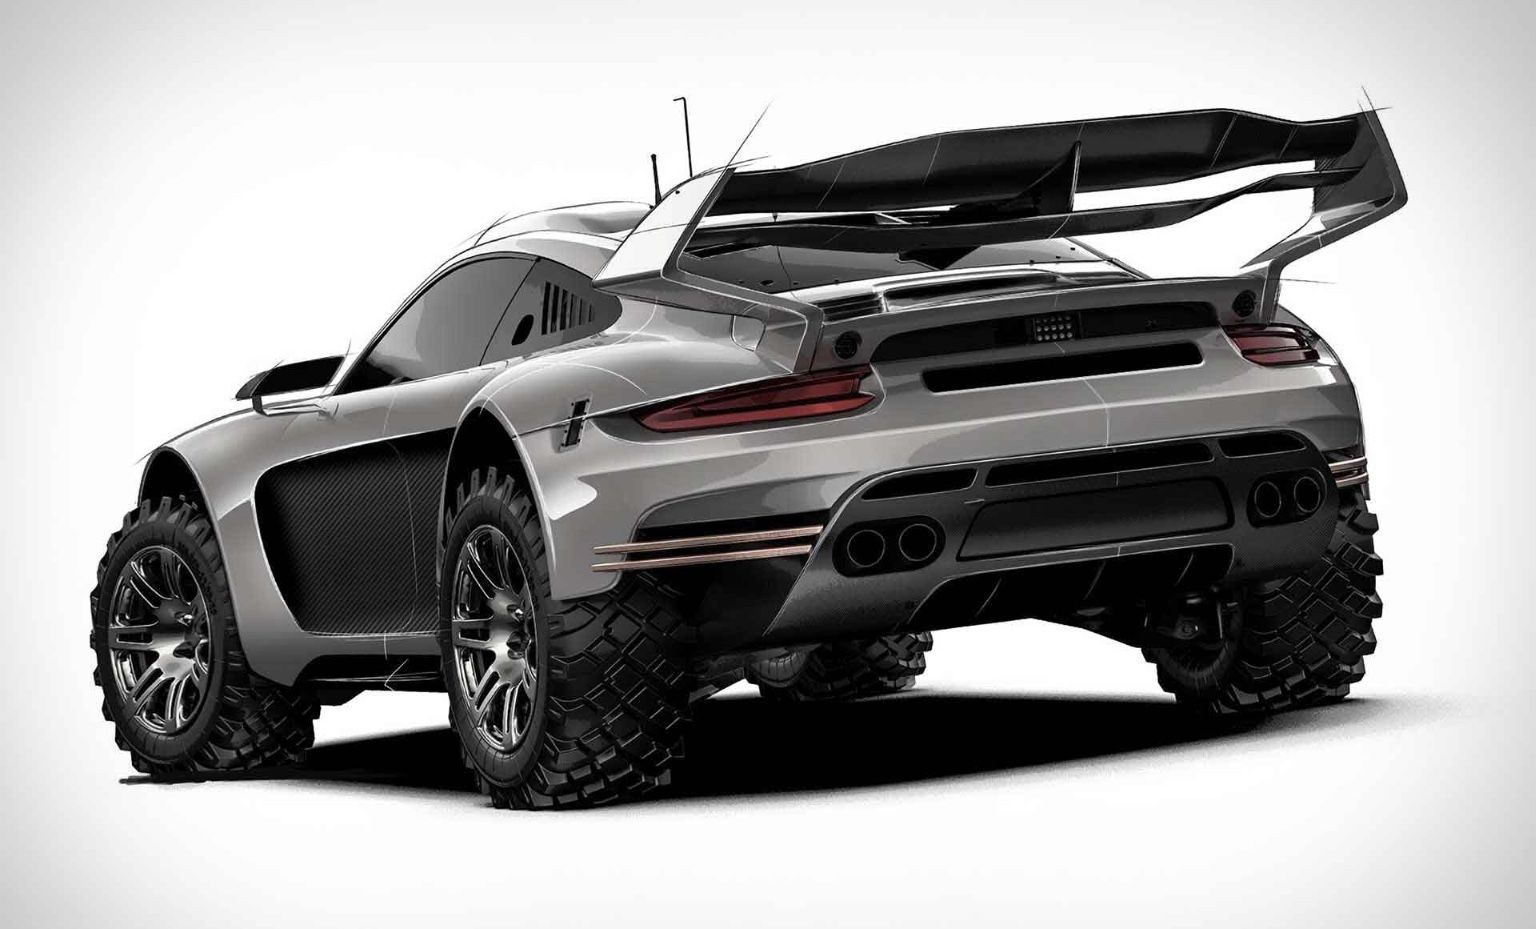 Pin By Mikestudio 56 On Cool Wheels In 2020 Porsche 911 Porsche Body Kit